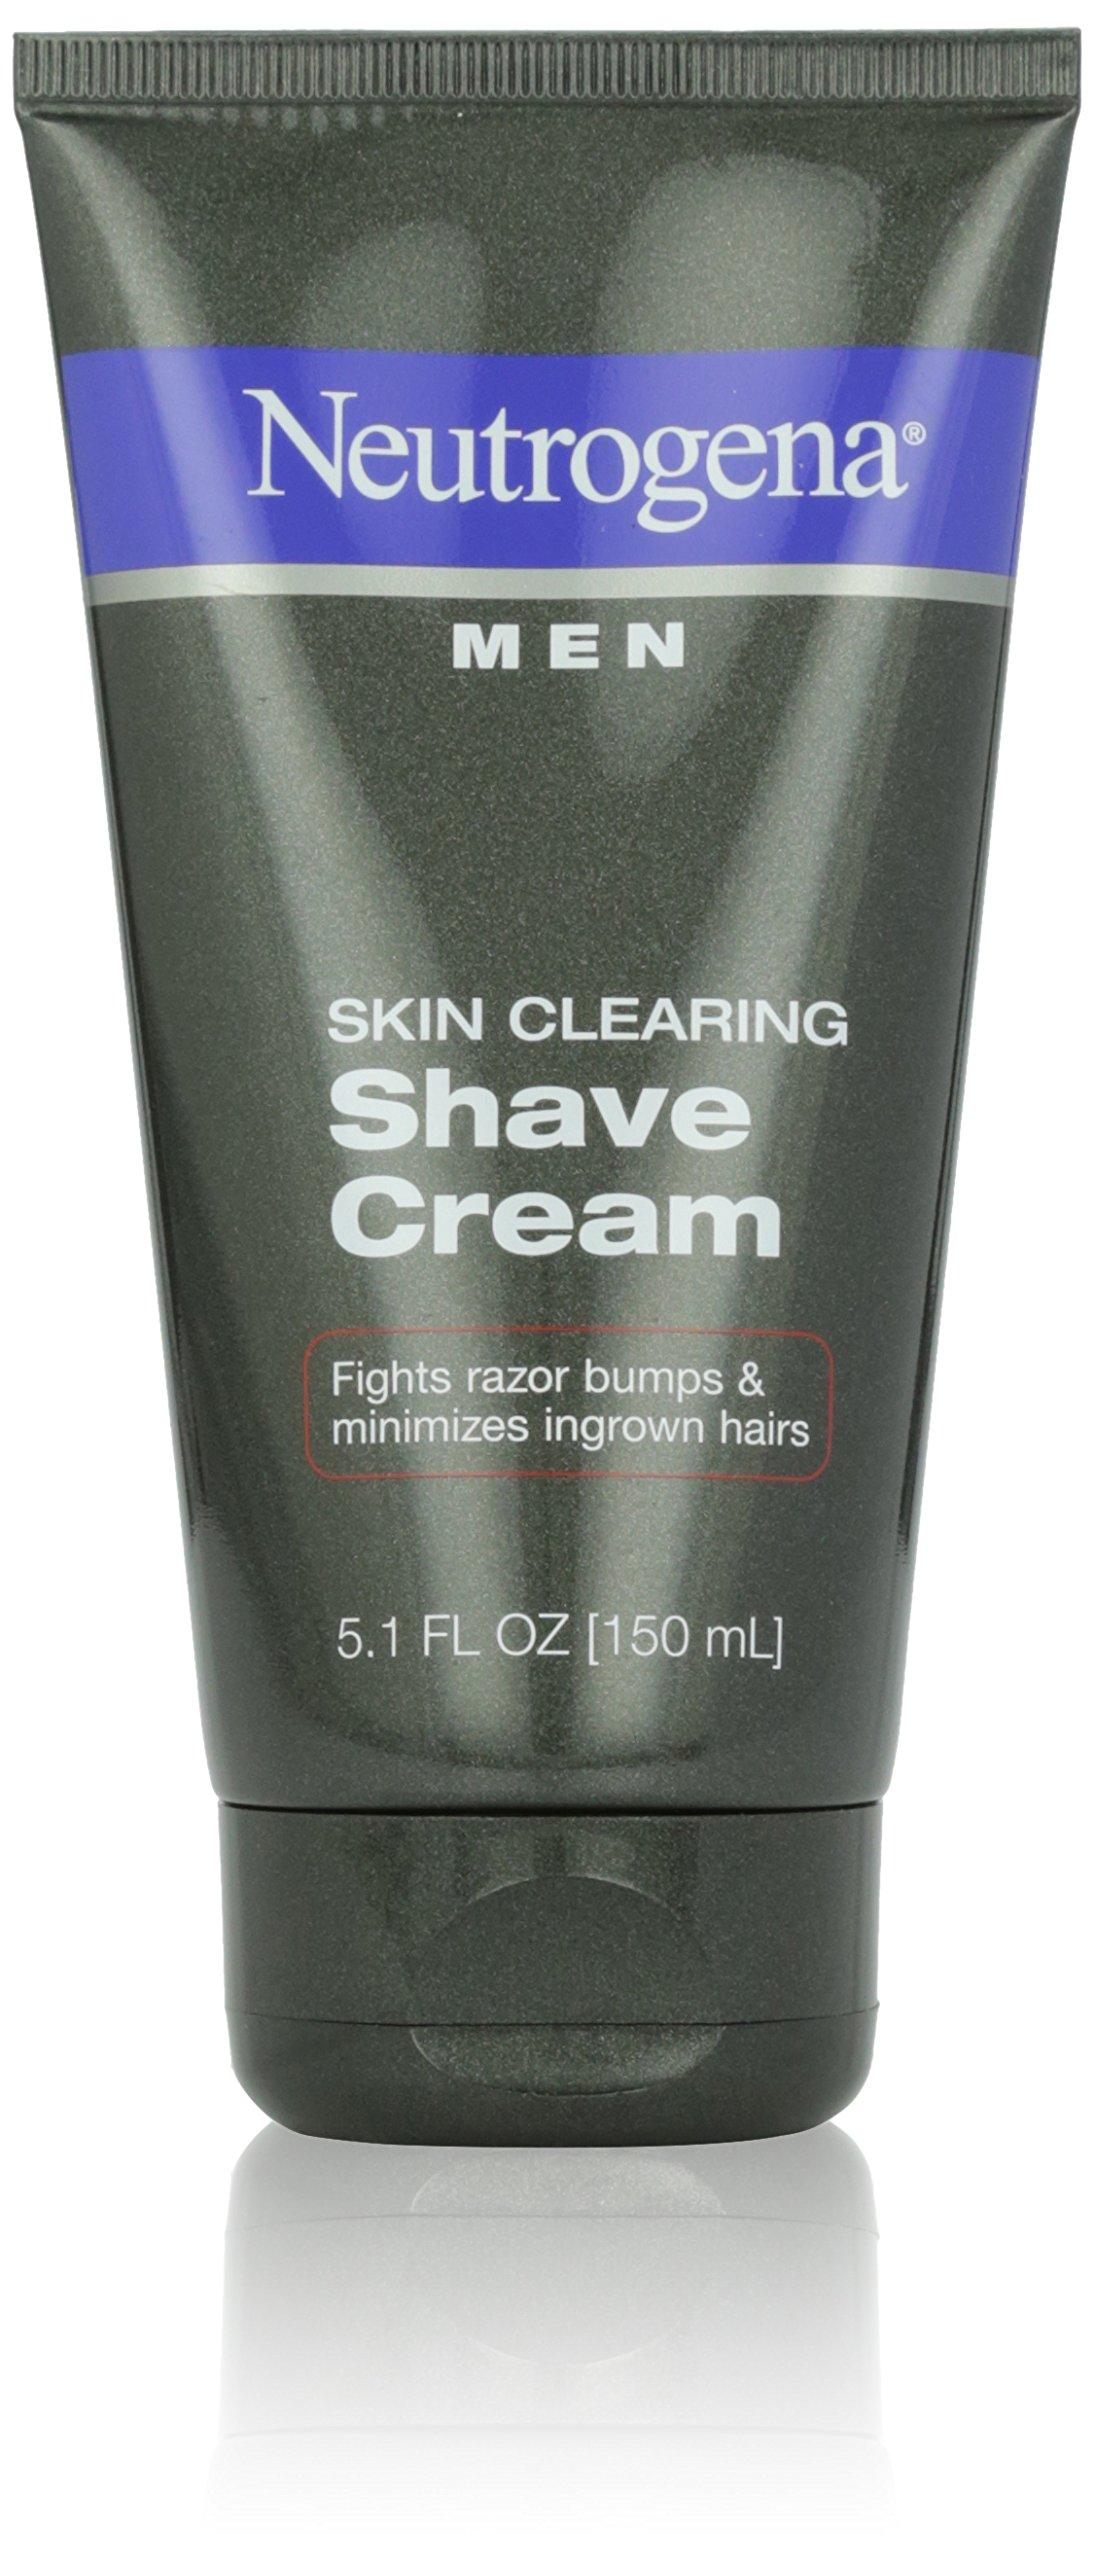 Neutrogena Men Skin Clearing Shave Cream, Oil-Free Shaving Cream to Help Prevent Razor Bumps & Ingrown Hairs, 5.1 fl. oz (Pack of 6) by Neutrogena